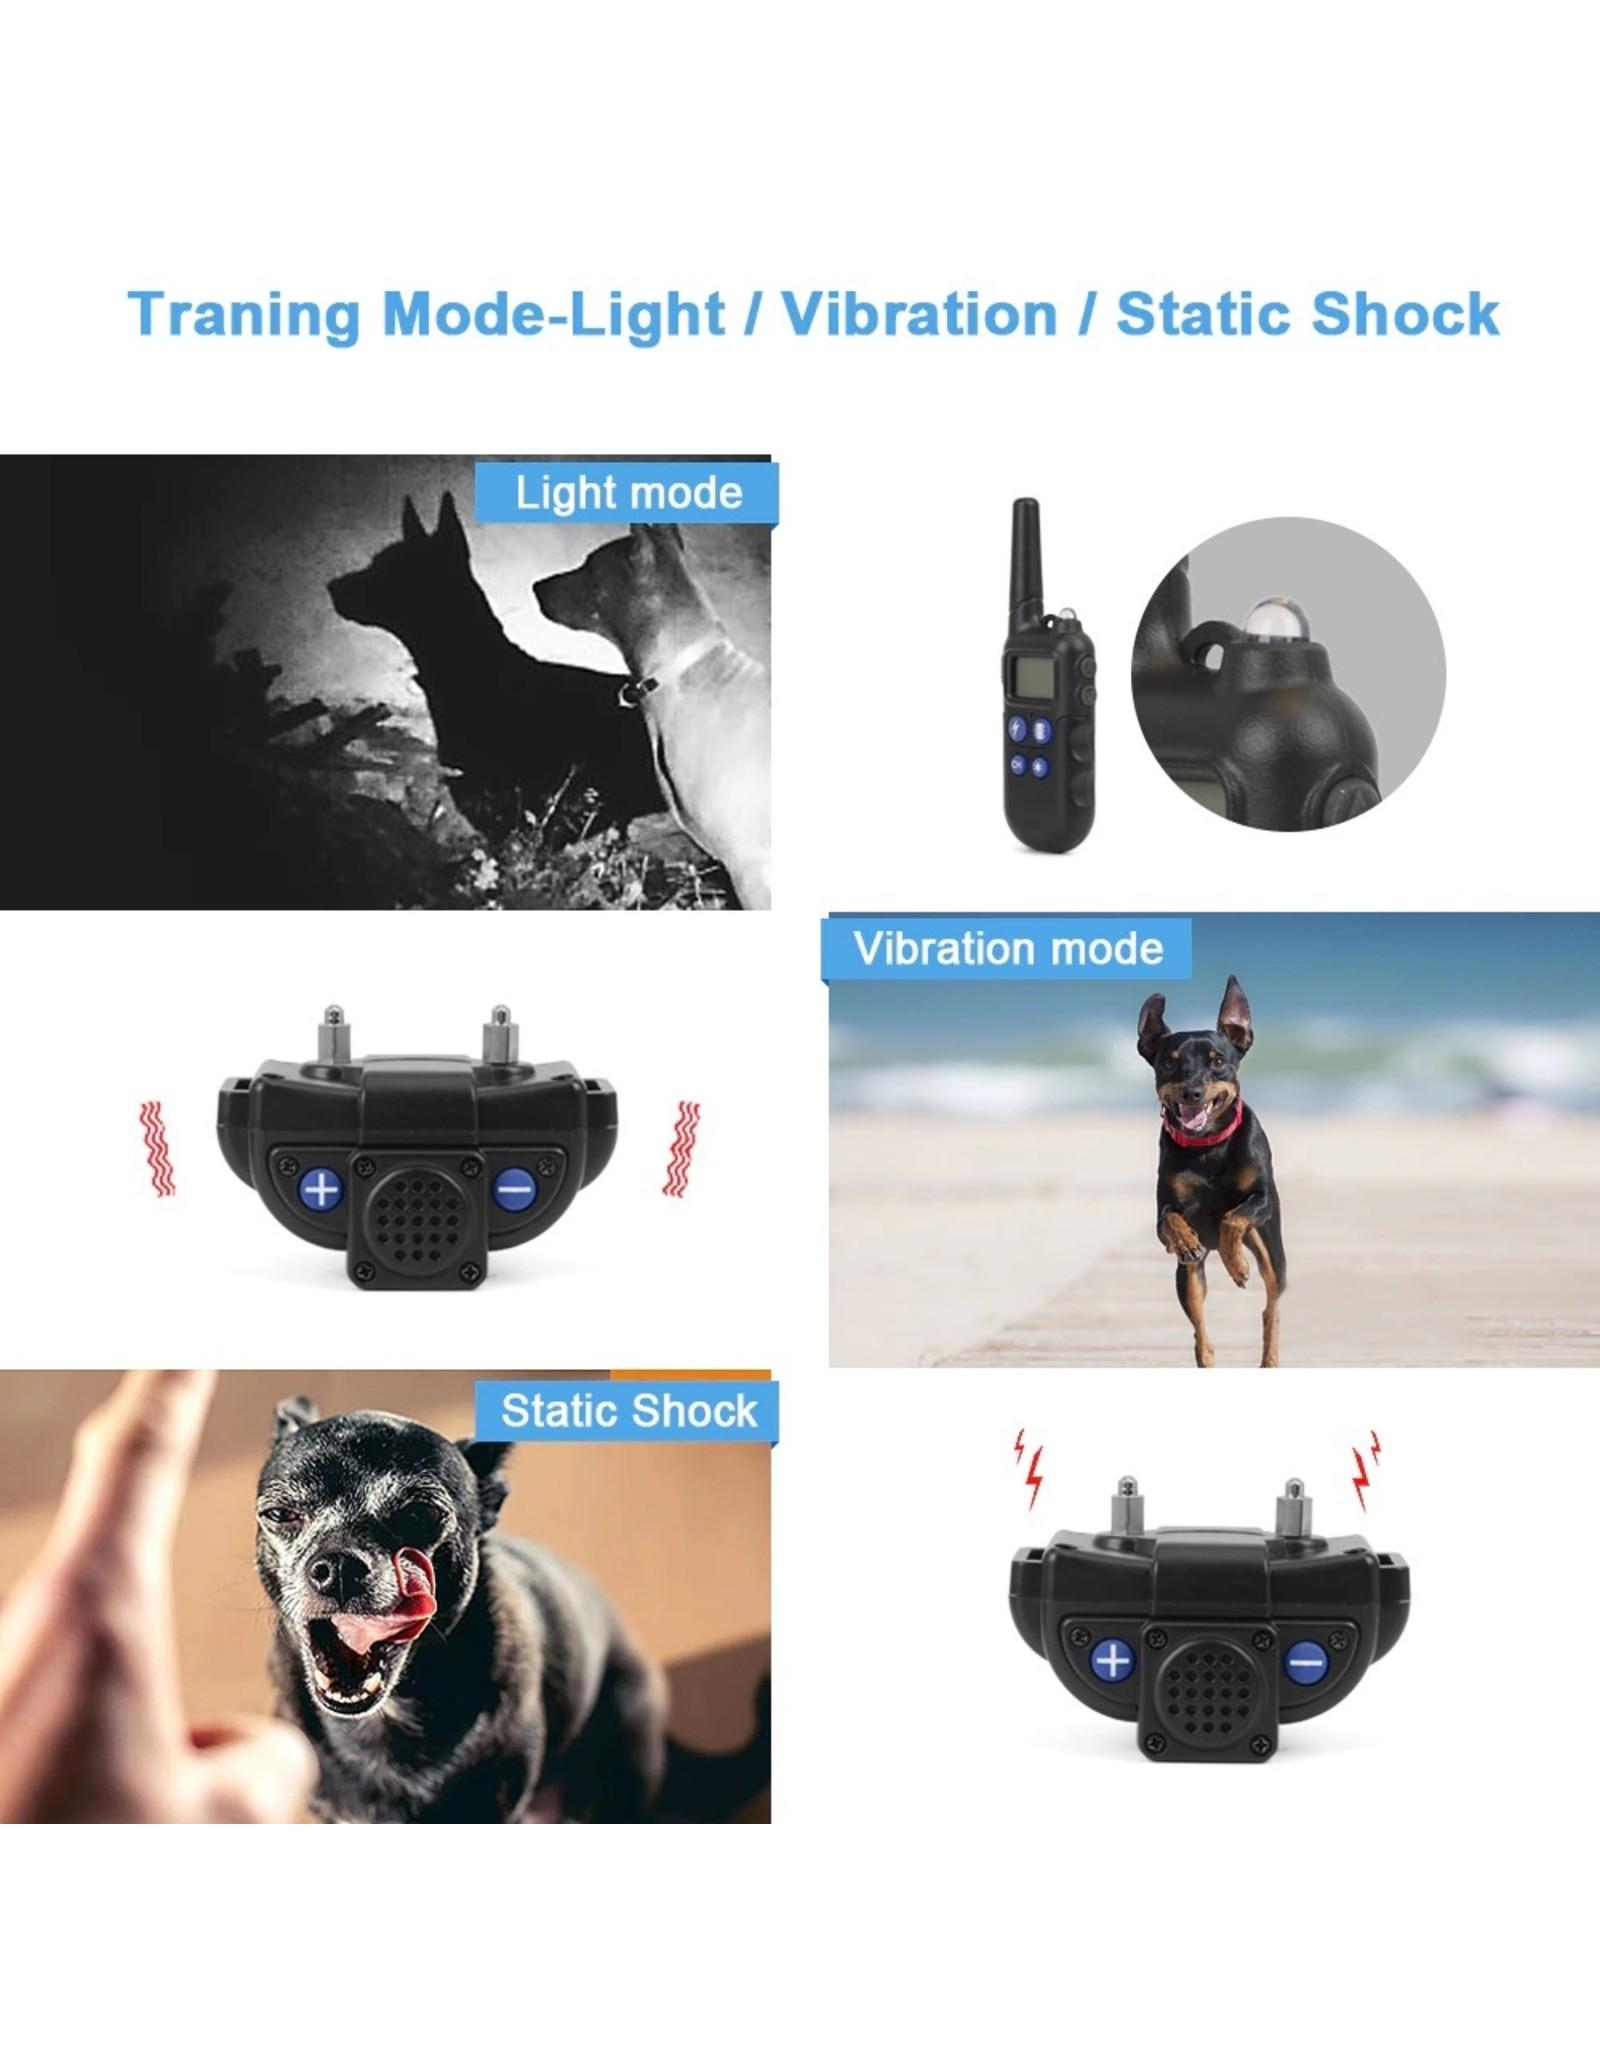 2000M hondentrainingshalsband met walkietalkie - Oplaadbare halsband voor honden - Halsband Modi Pieptoon Trillingen Schok - waterdichte trainingshalsband